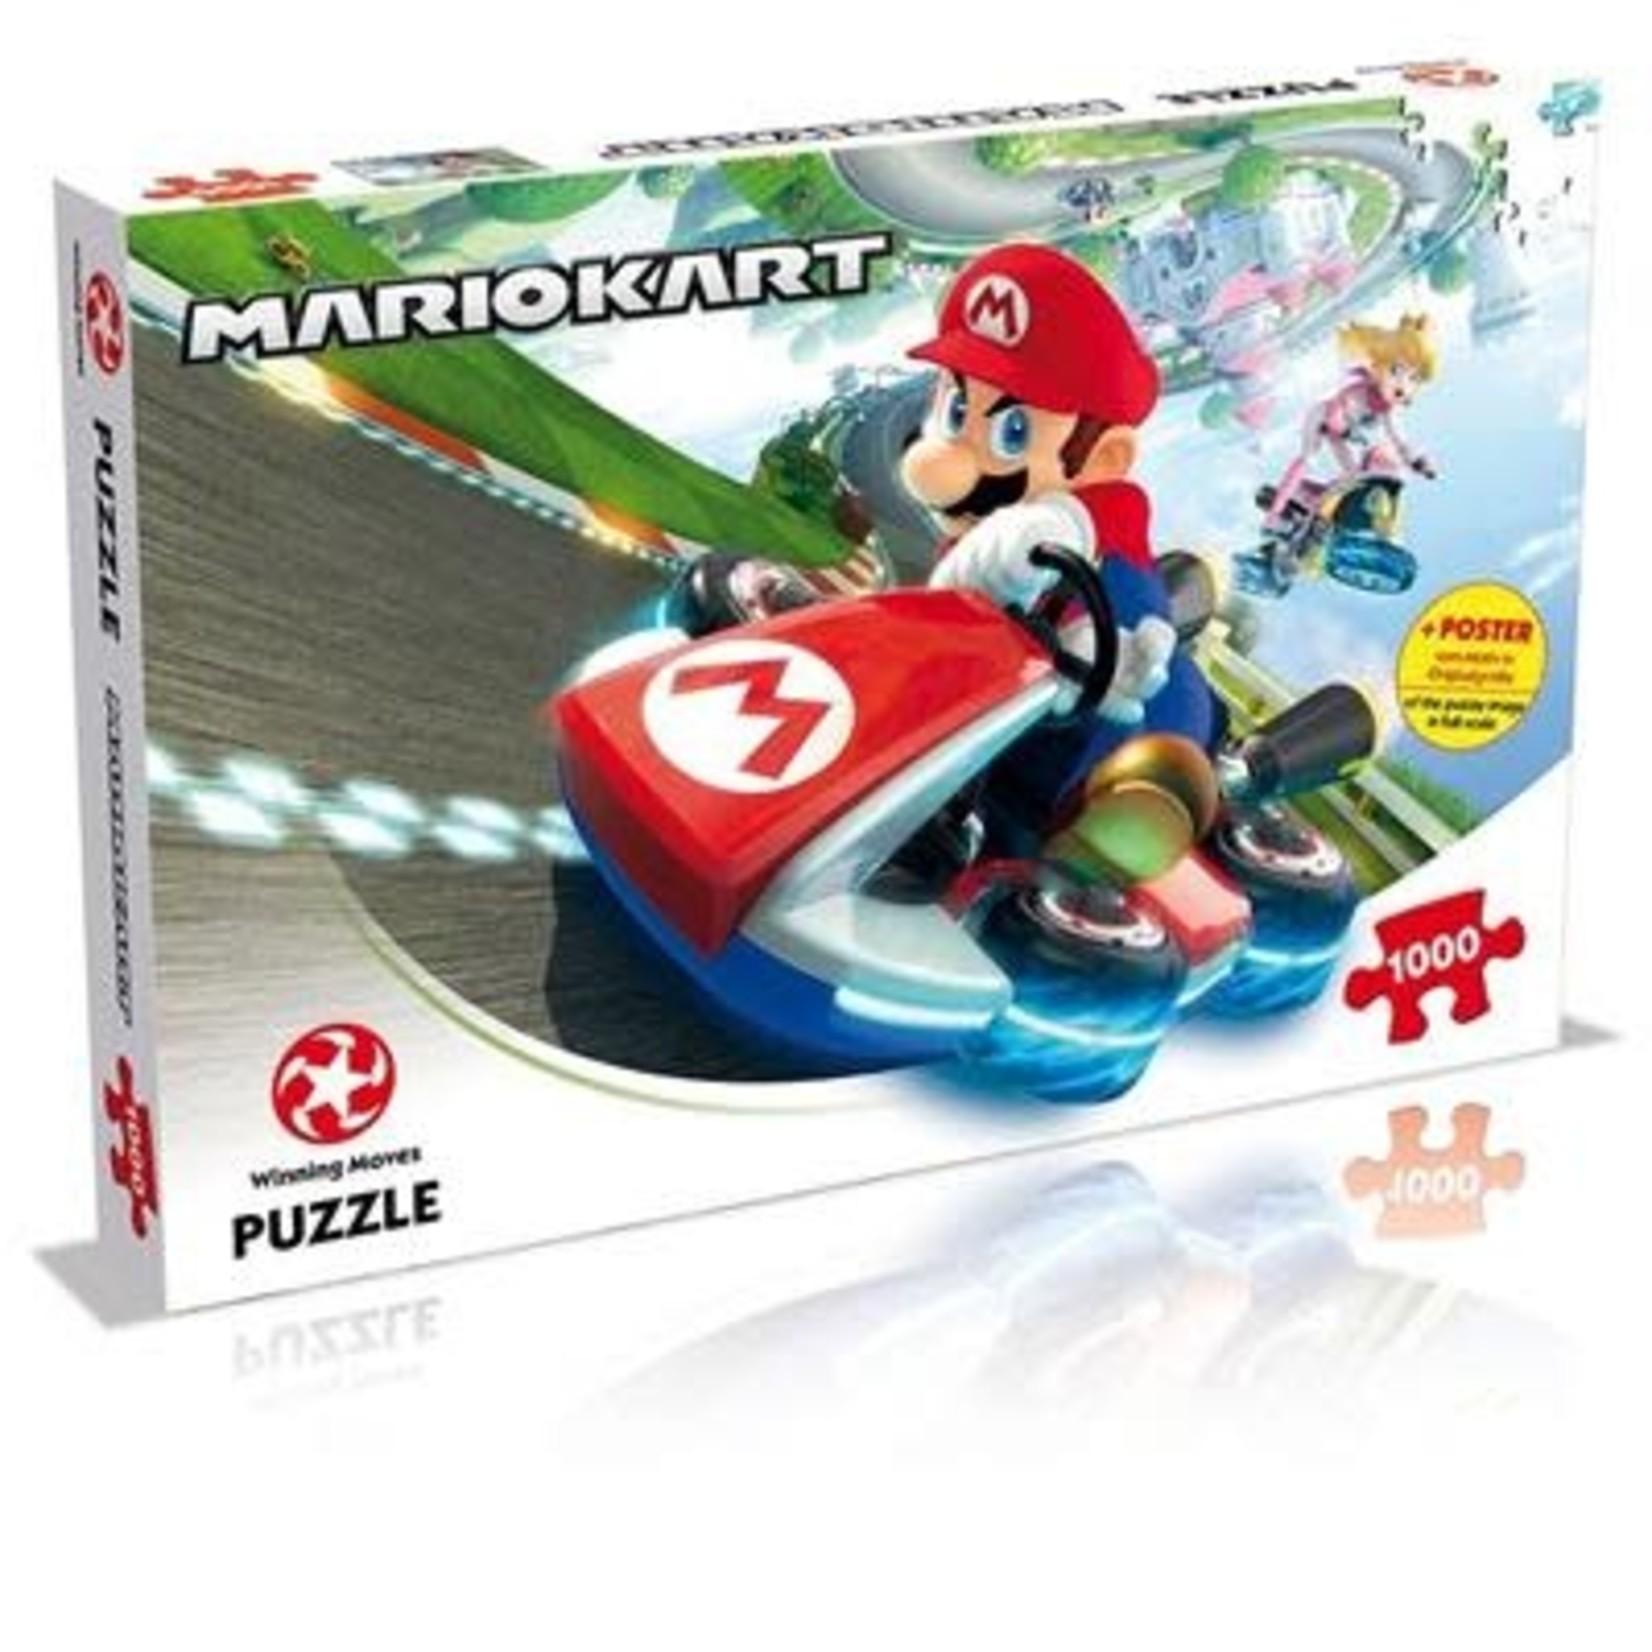 Winning Moves Puzzle Mario Kart - 1000st